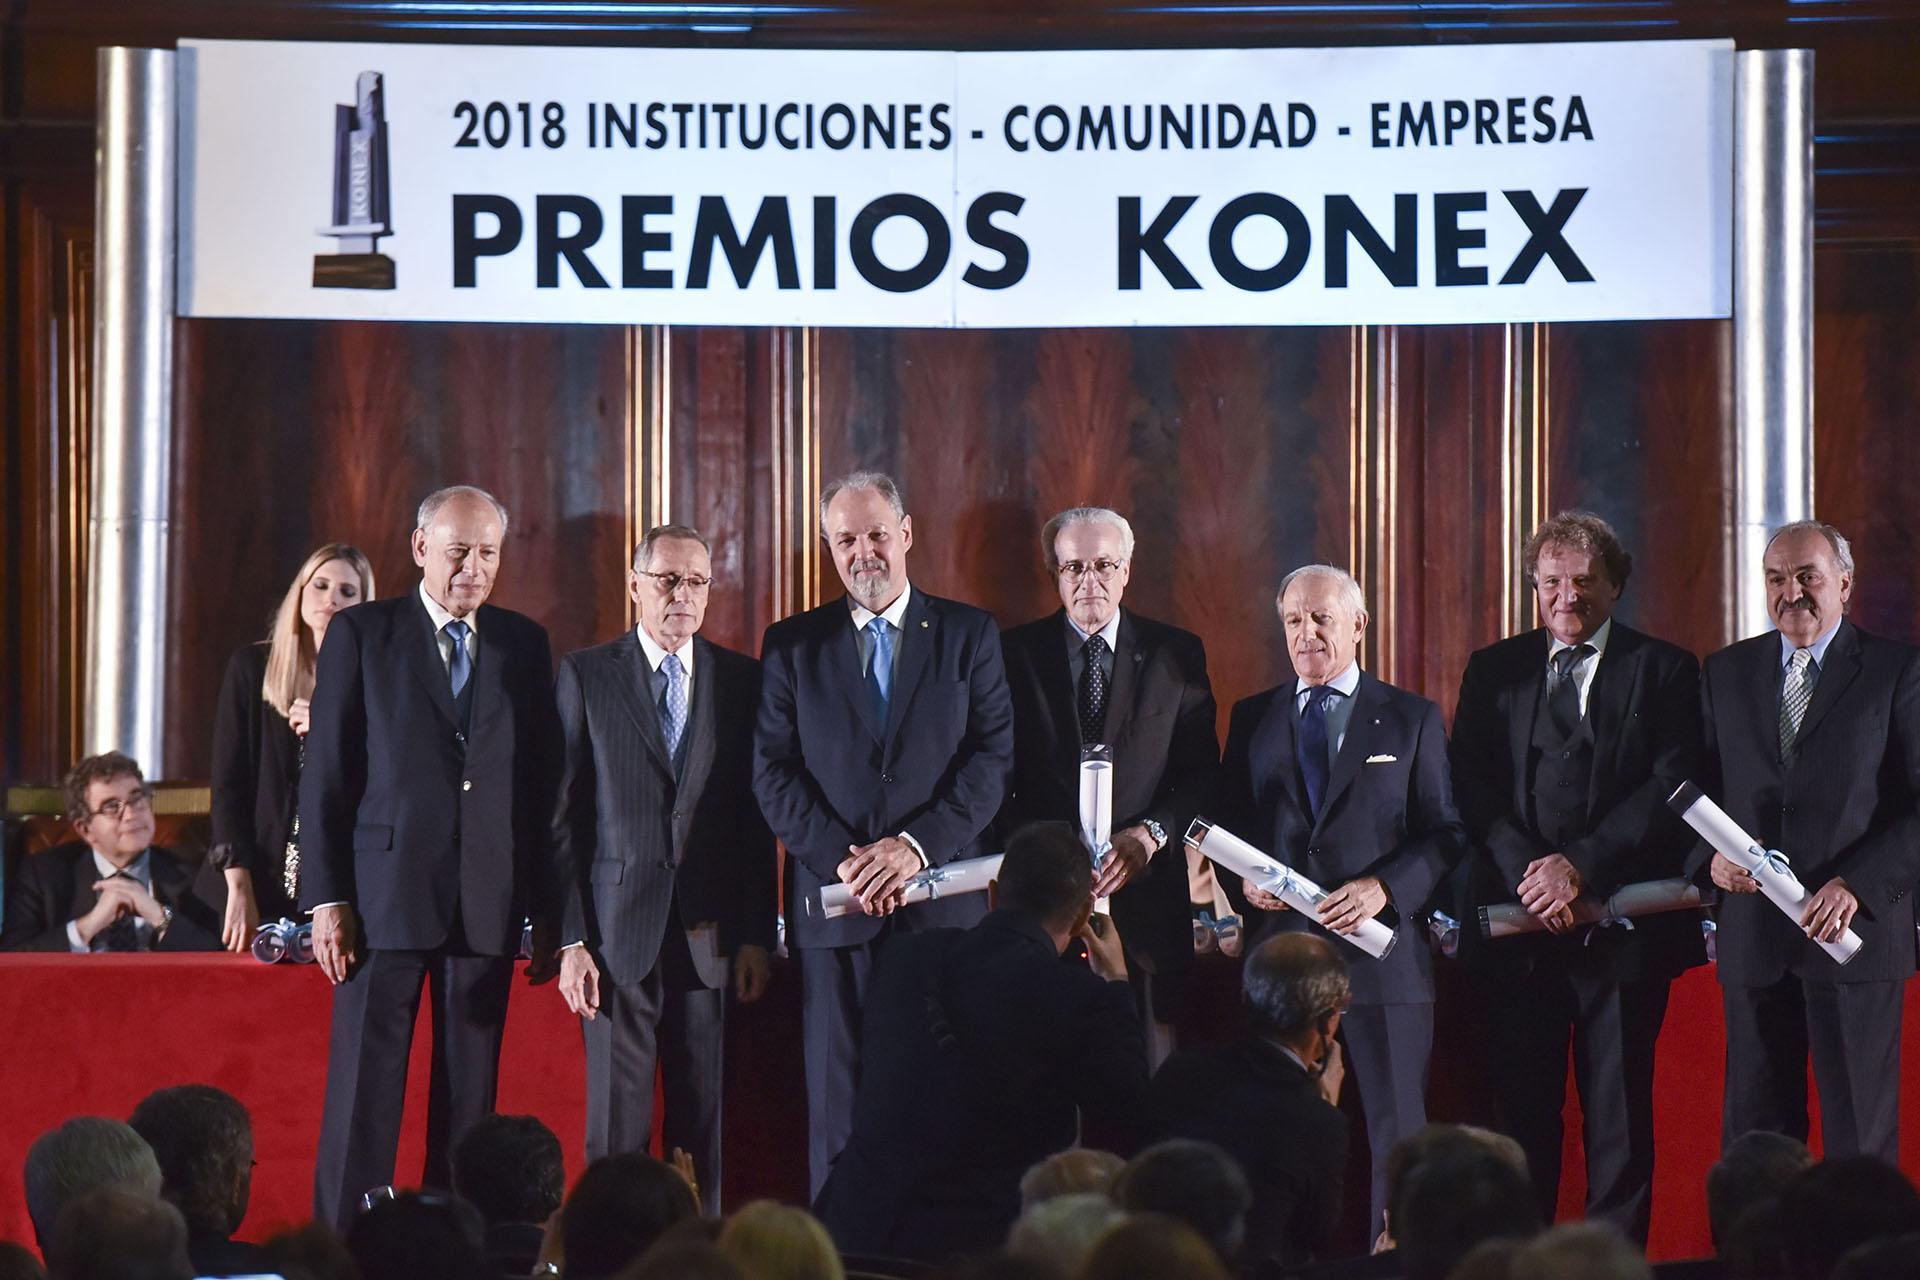 Diplomáticos: Ricardo Ernesto Lagorio, Eduardo Mallea, Rogelio Pfirter, Renato Carlos Sersale di Cerisano y Pedro Villagra Delgado